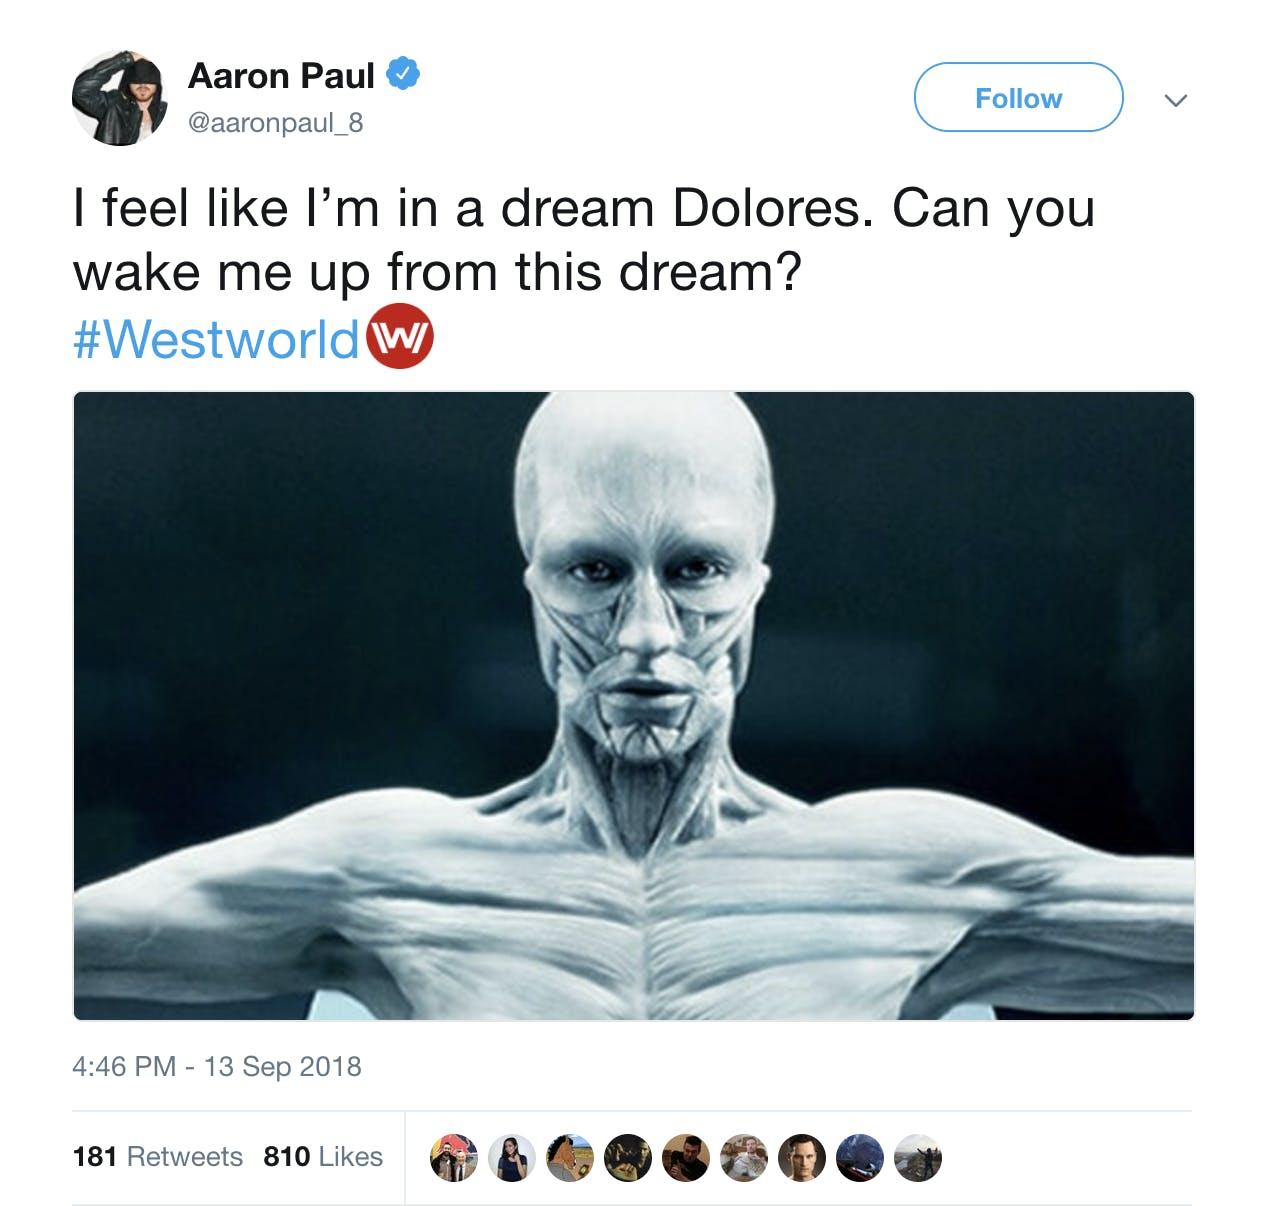 westworld season 3 - aaron paul